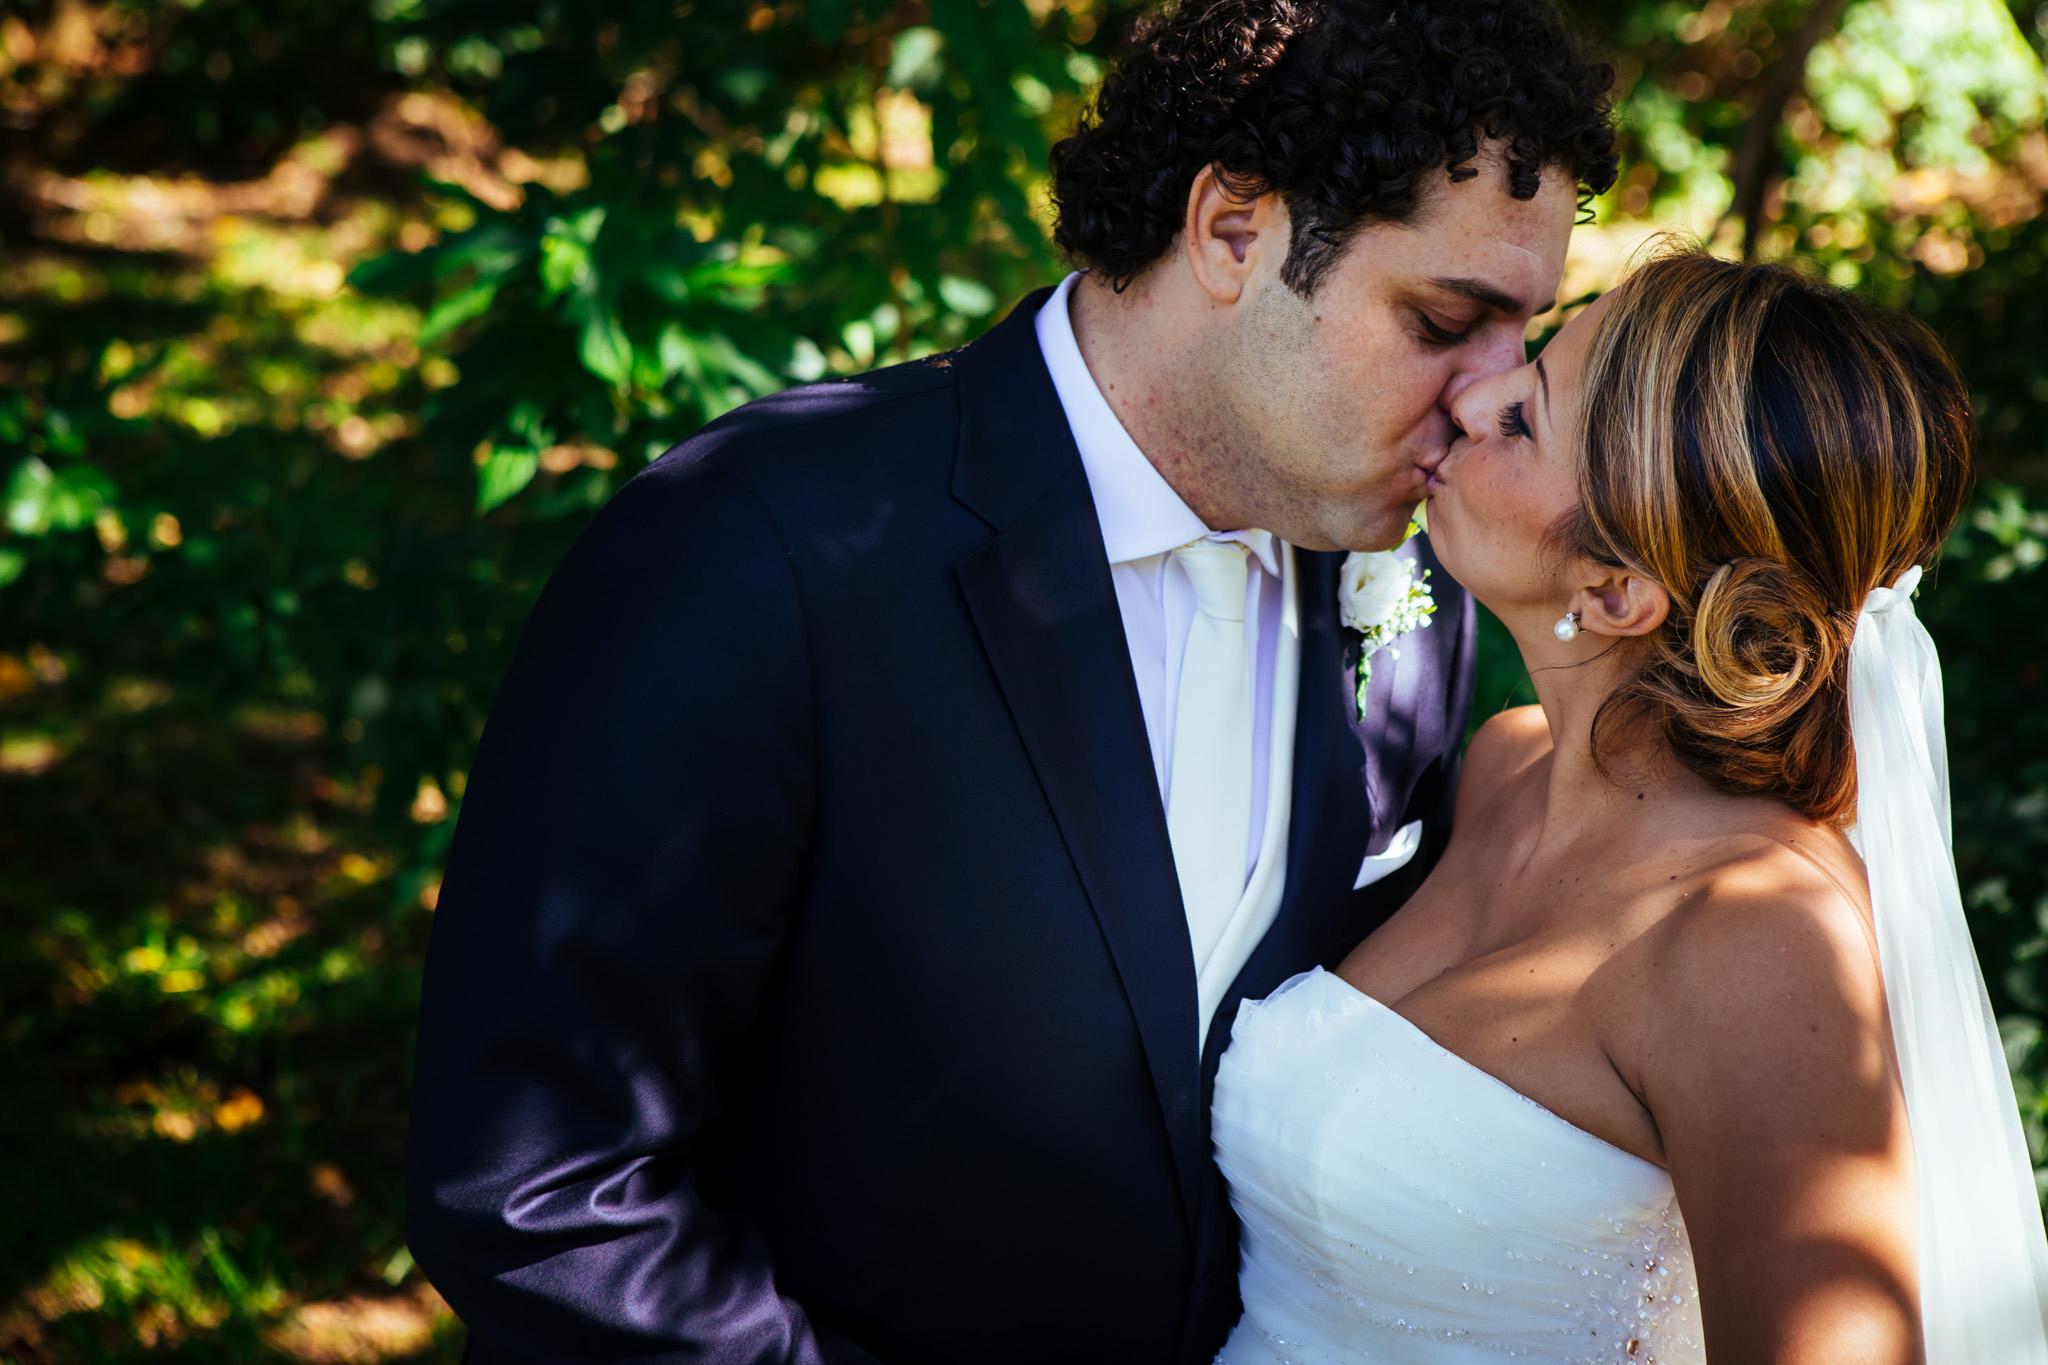 matrimonio-a-catania-50.jpg